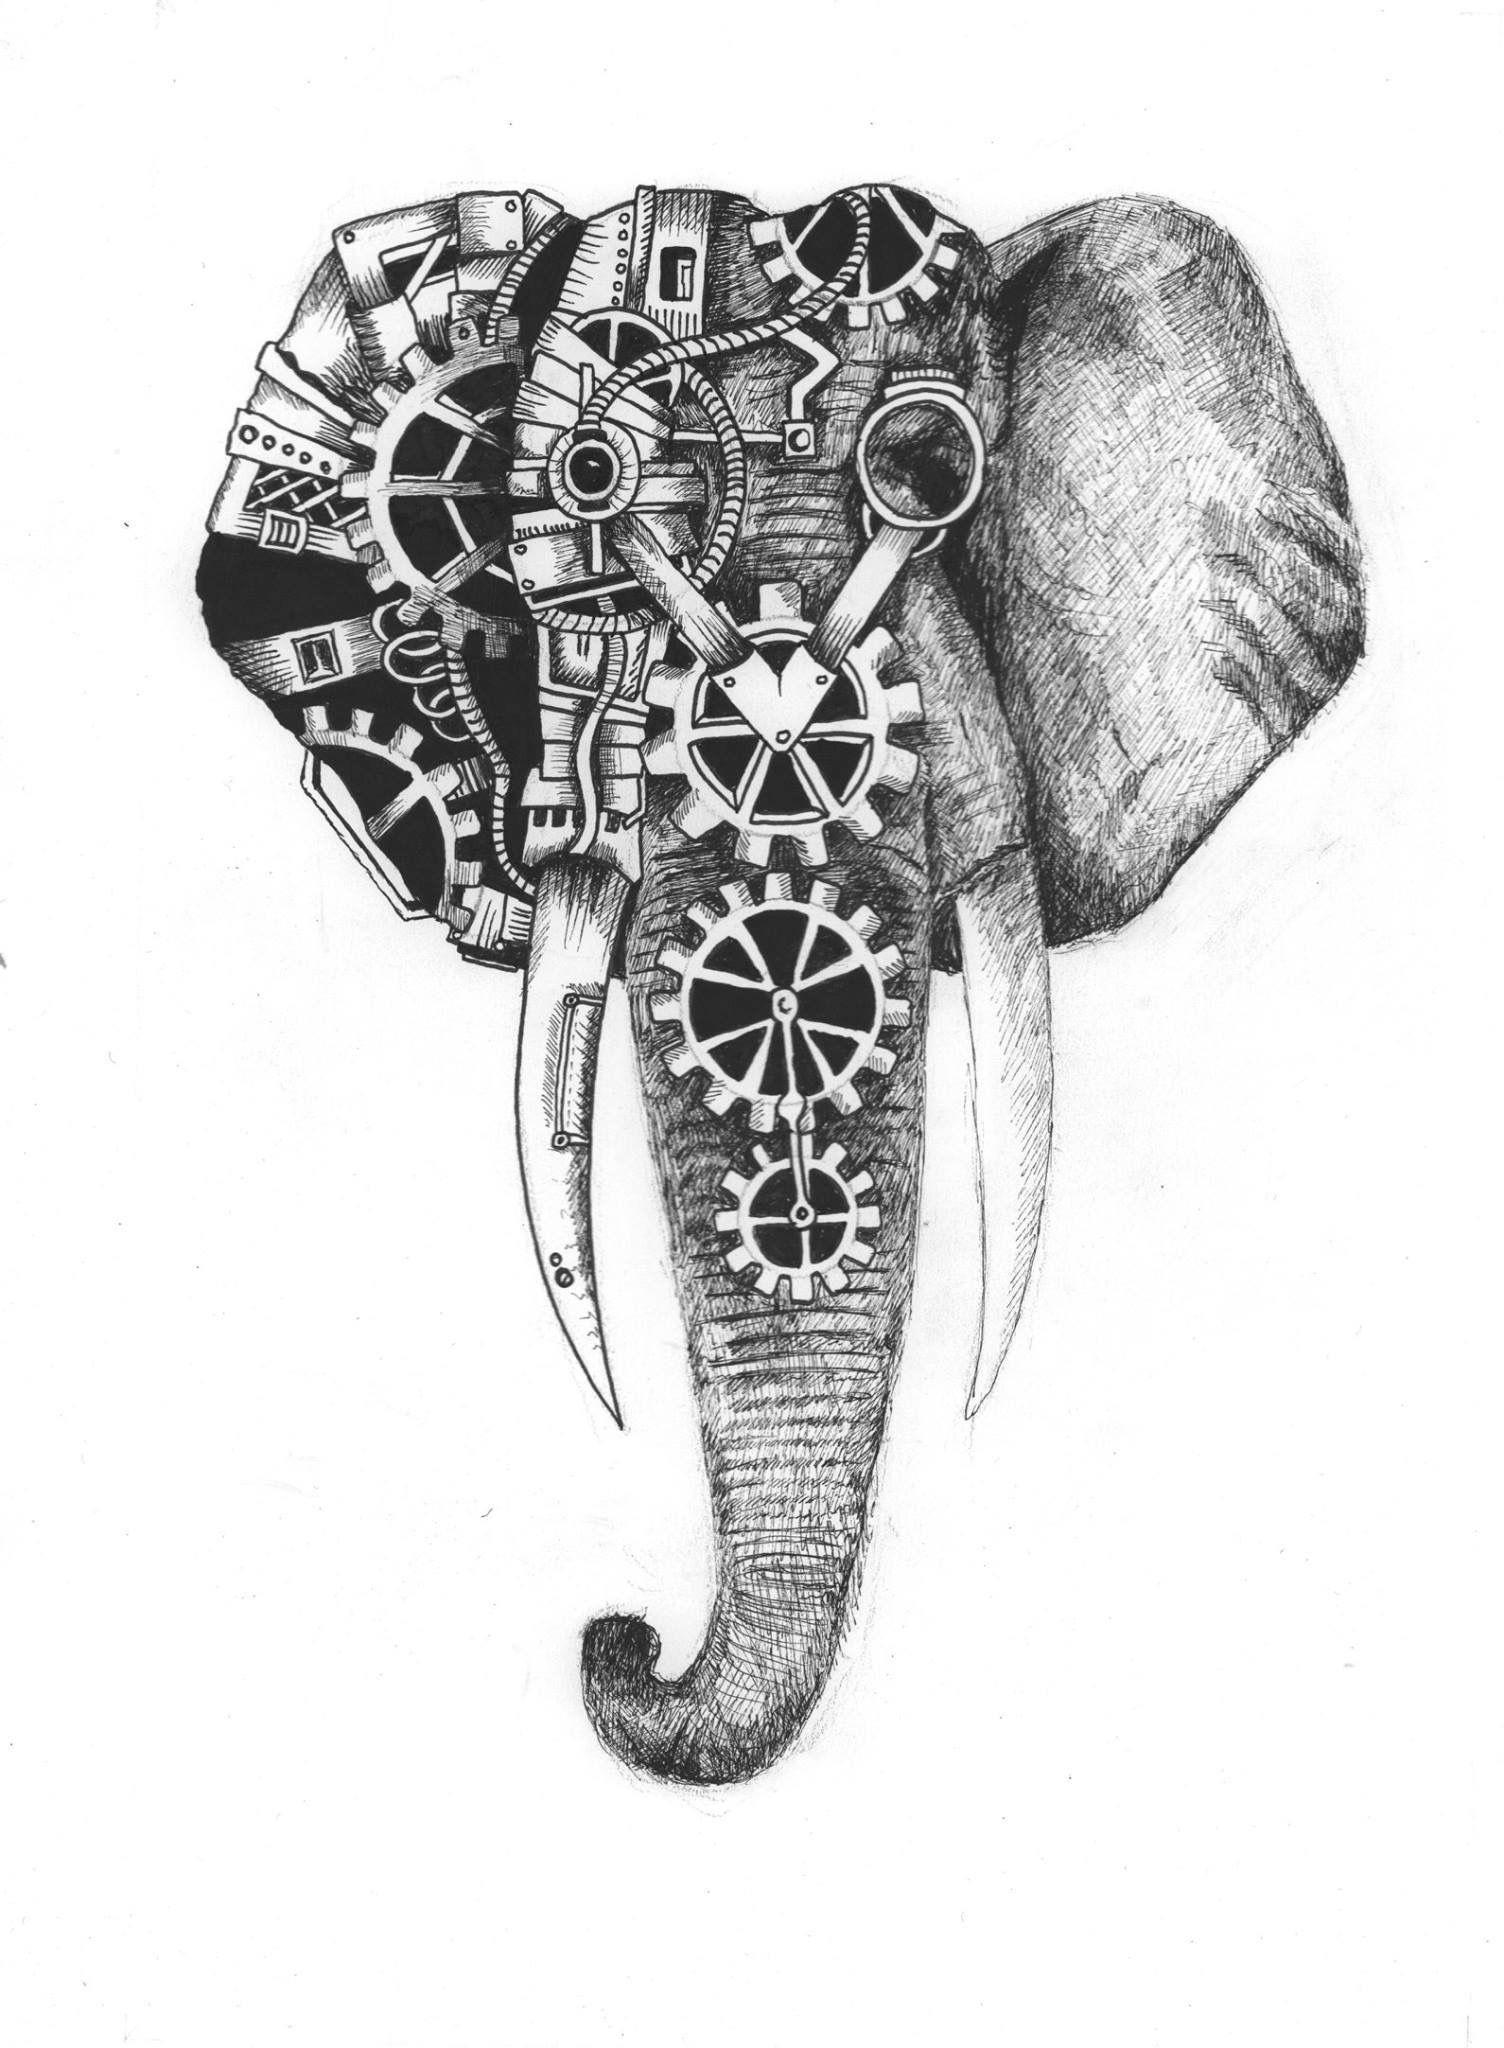 Pin by Brittani on Elephants | Steampunk artwork ...